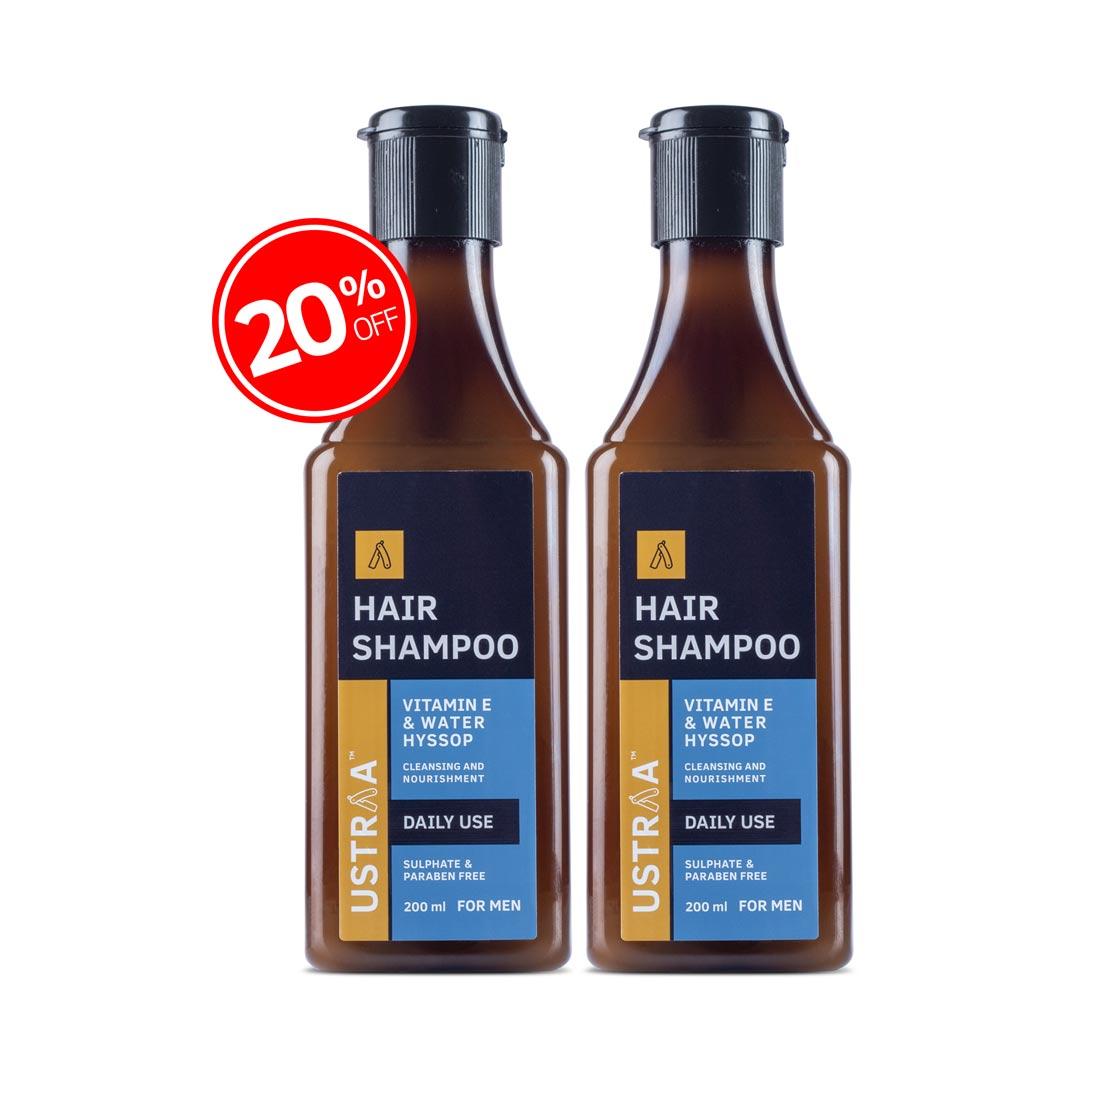 Daily Use Hair Shampoo - Set Of 2